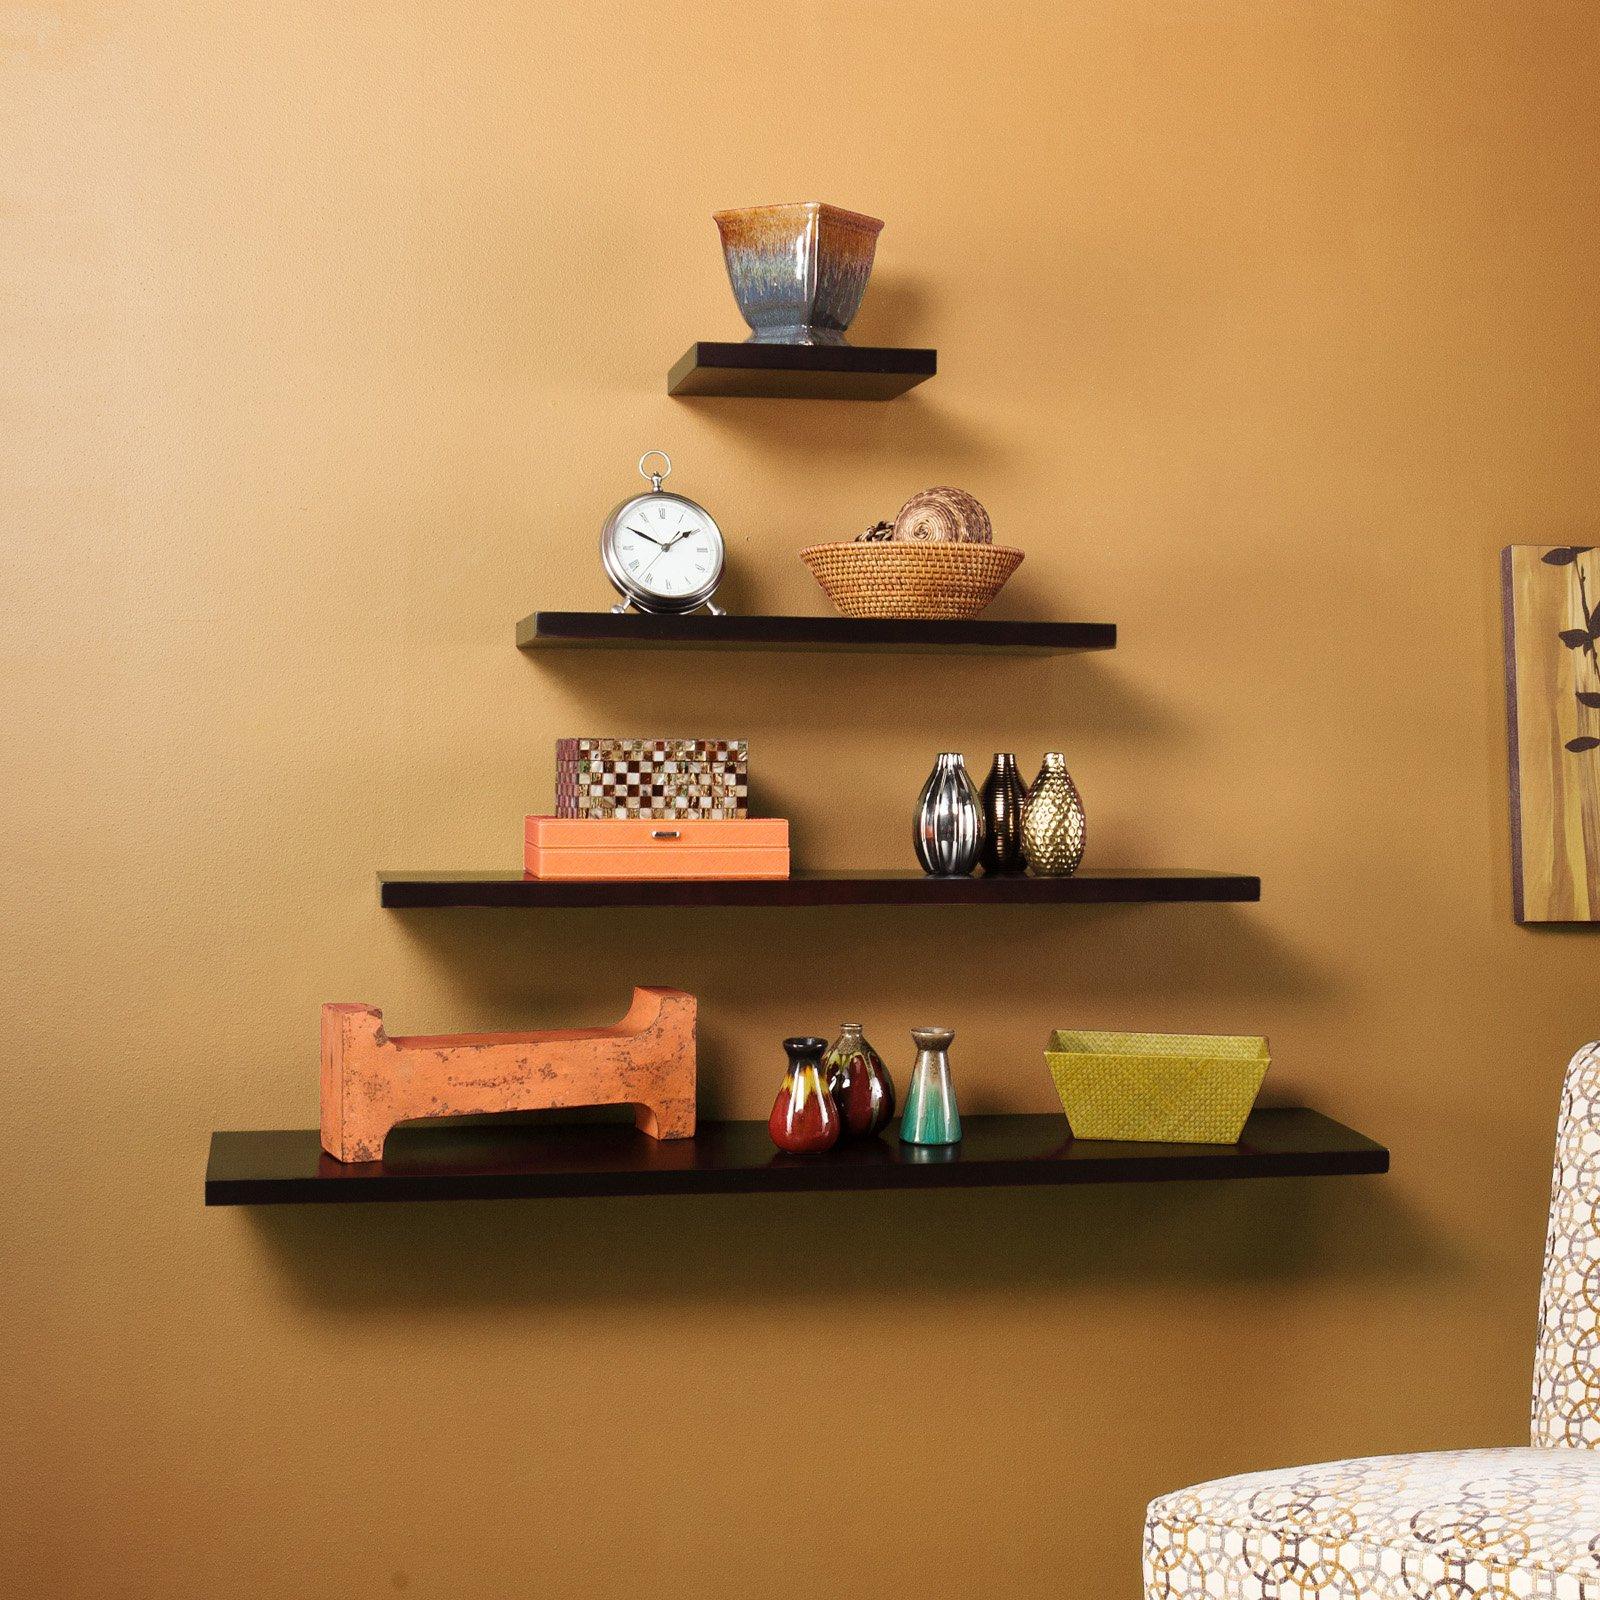 denver floating shelf espresso black brown shelves ikea cubby storage kitchen wall holders cool shoe cabinet diy desk plans rack built into metal and wood leaning bookshelf